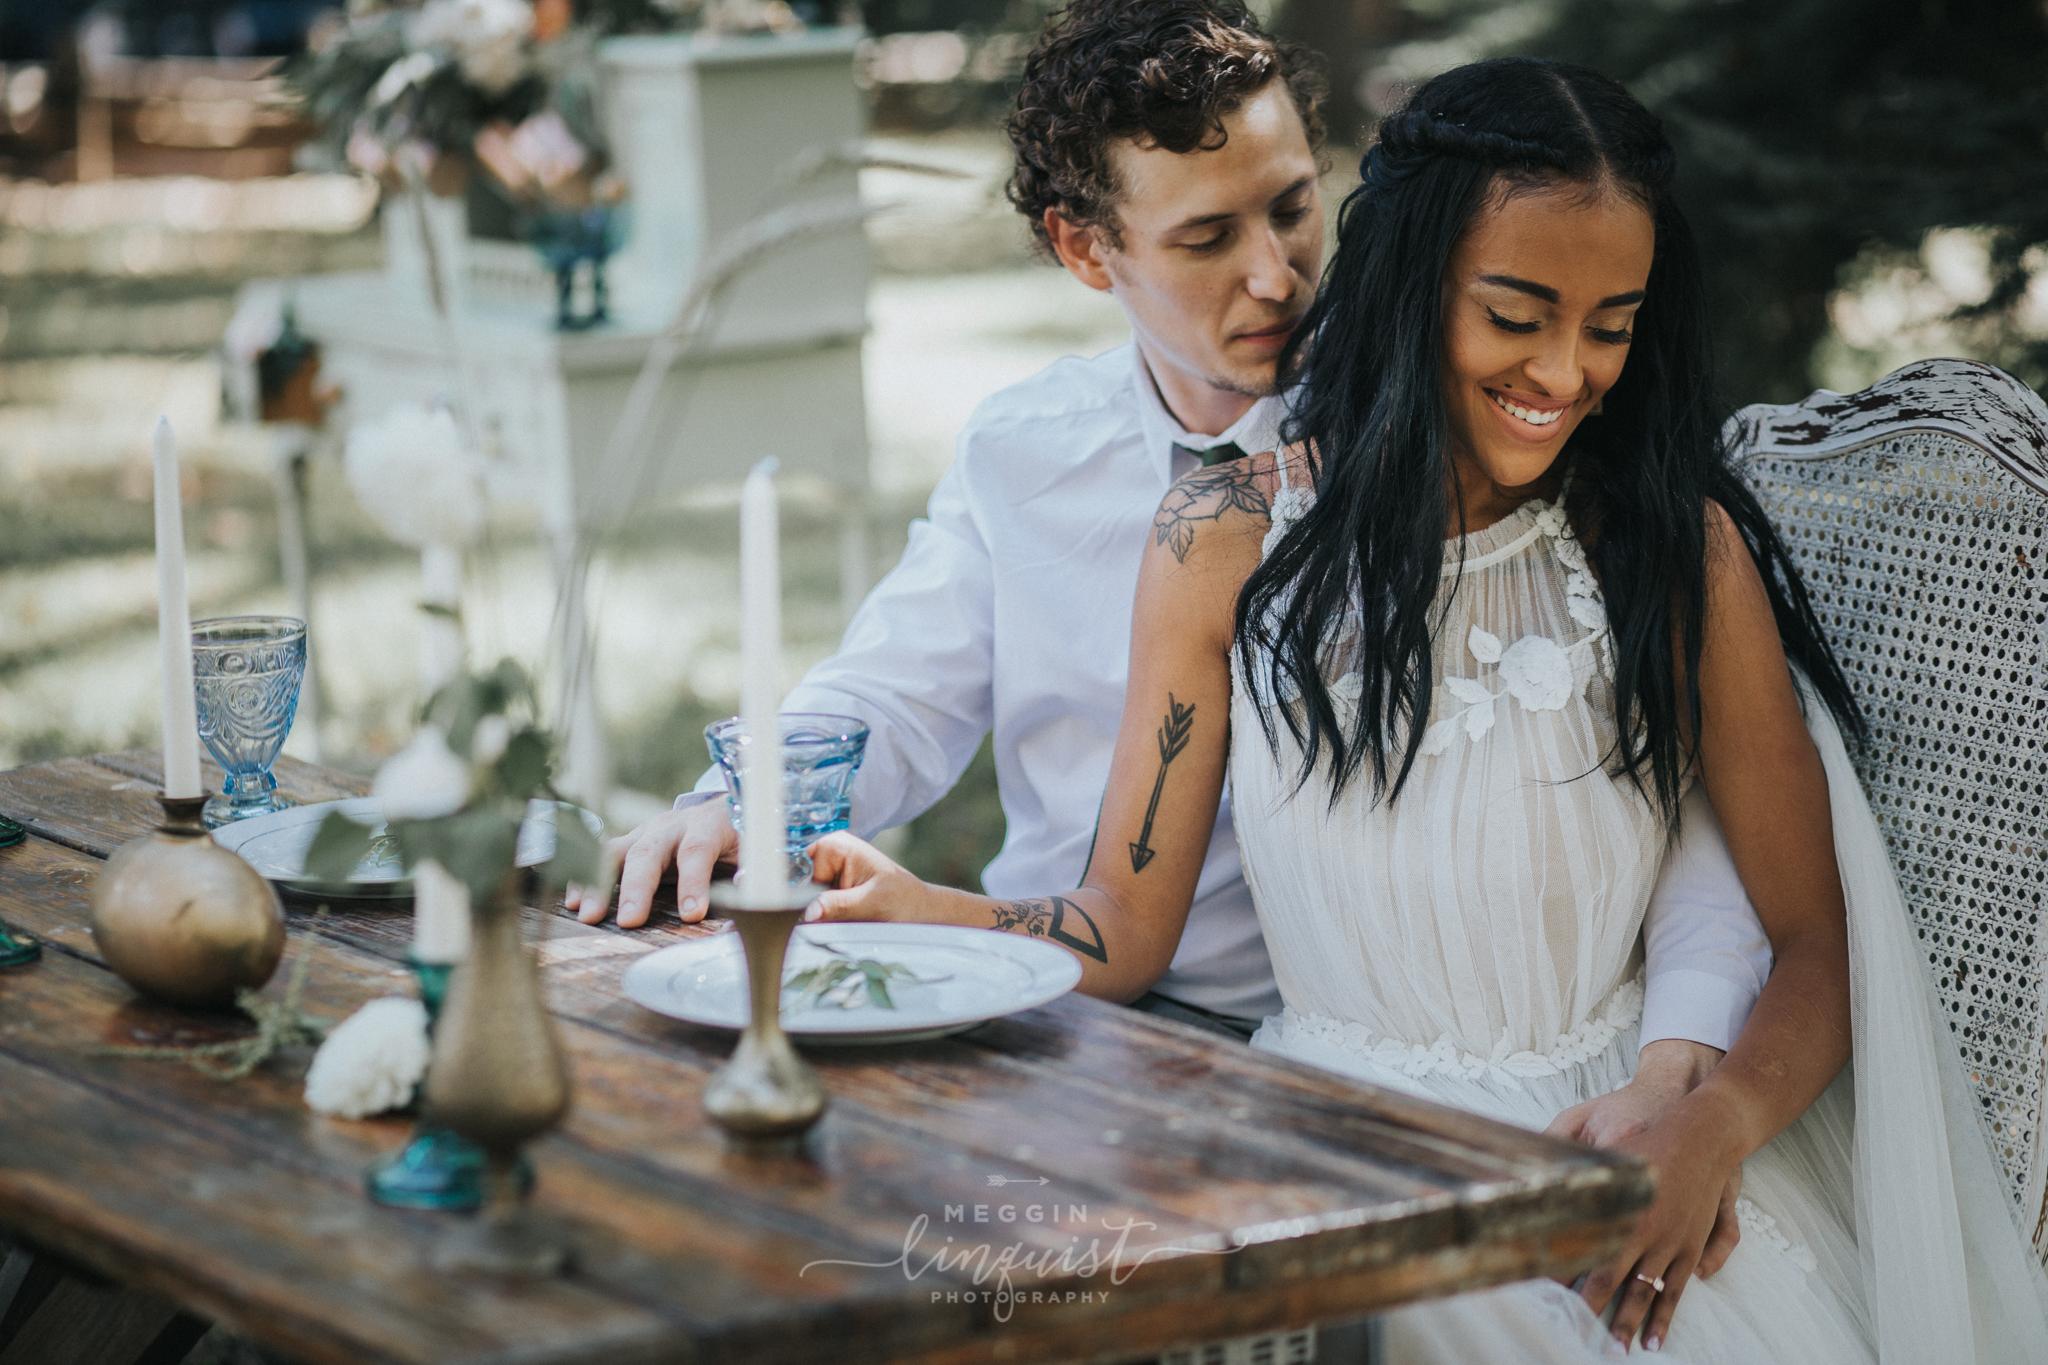 vintage-themed-wedding-reno-lake-tahoe-wedding-photographer-26.jpg